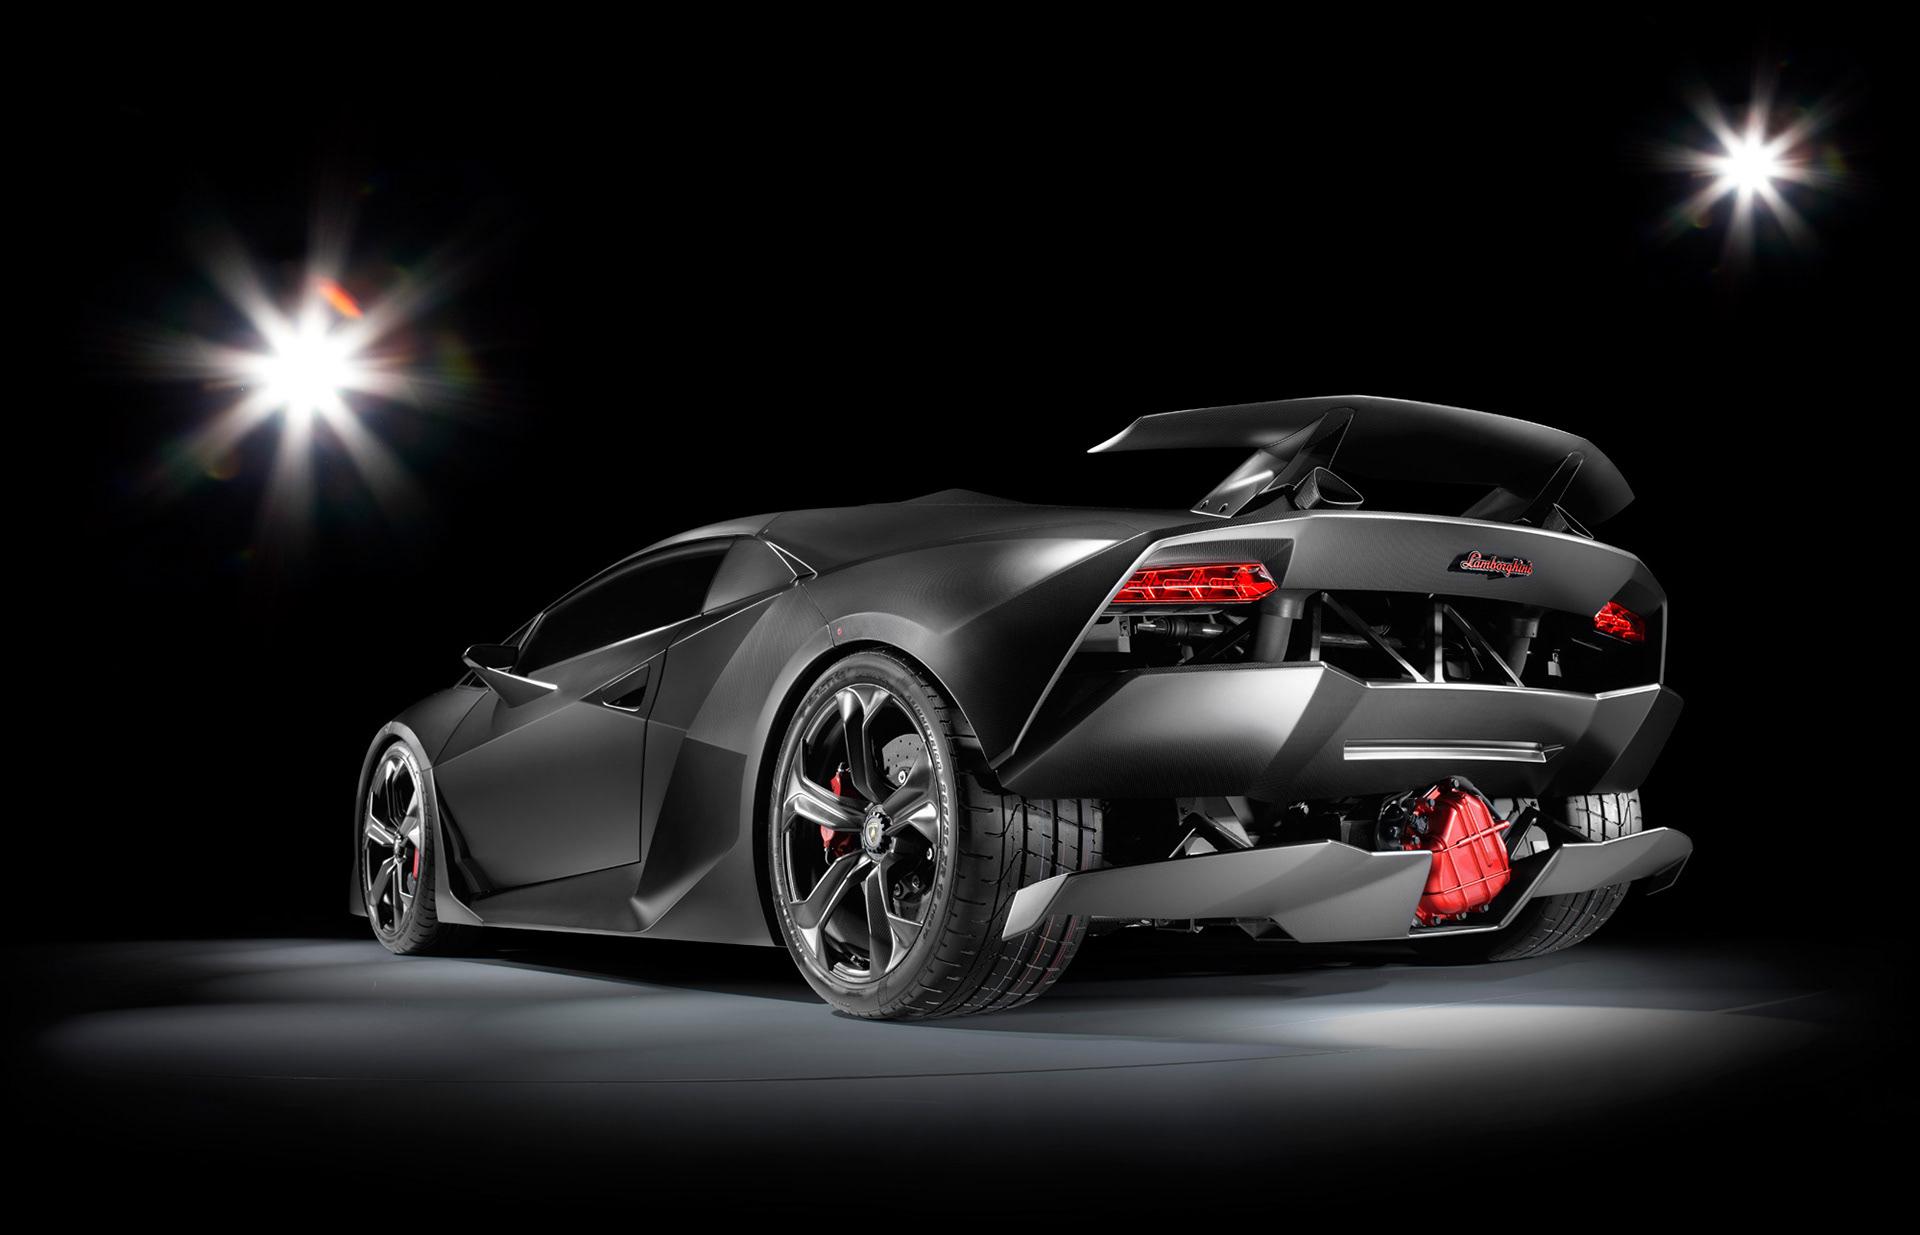 William Crozes Stills Motion Lamborghini Sesto Elemento Concept